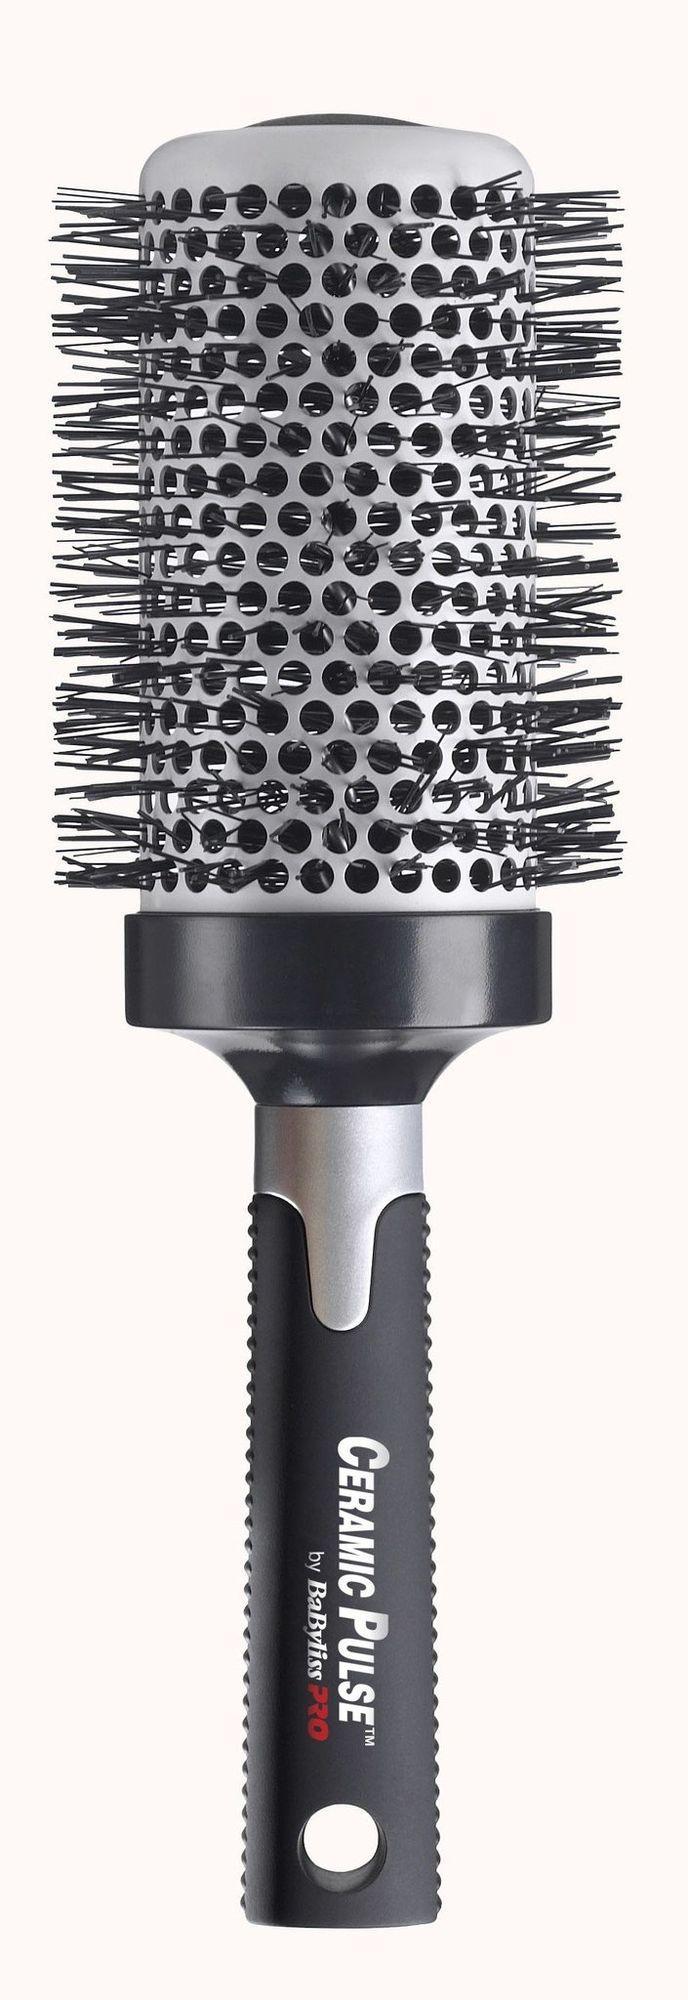 Afbeelding van Babyliss PRO Ceramic Brush Extra Large zwart 52mm